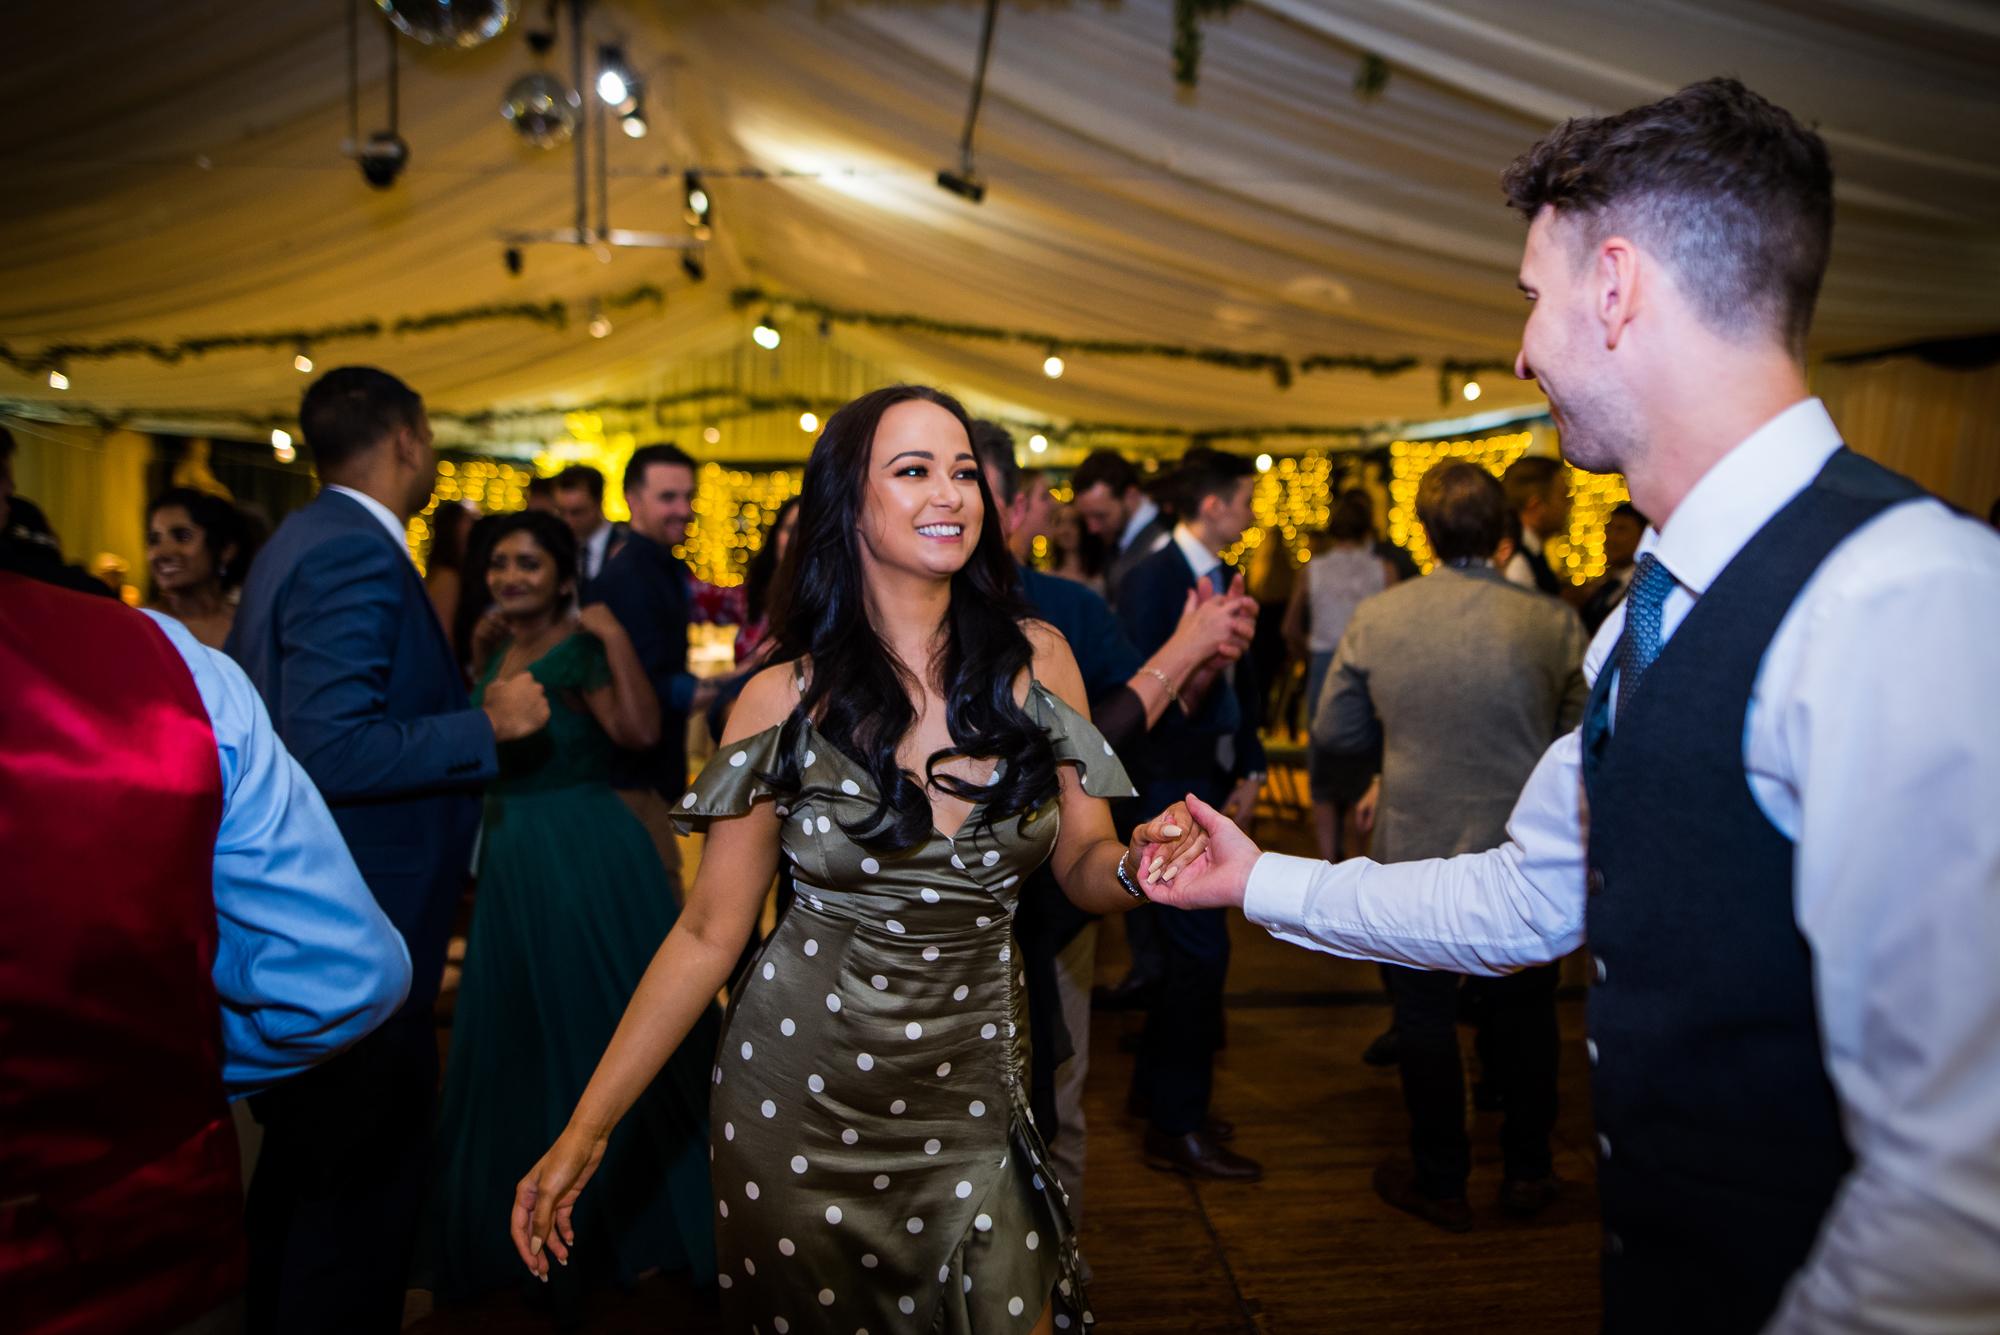 Kev and Shrabani wedding photos (334 of 350).jpg